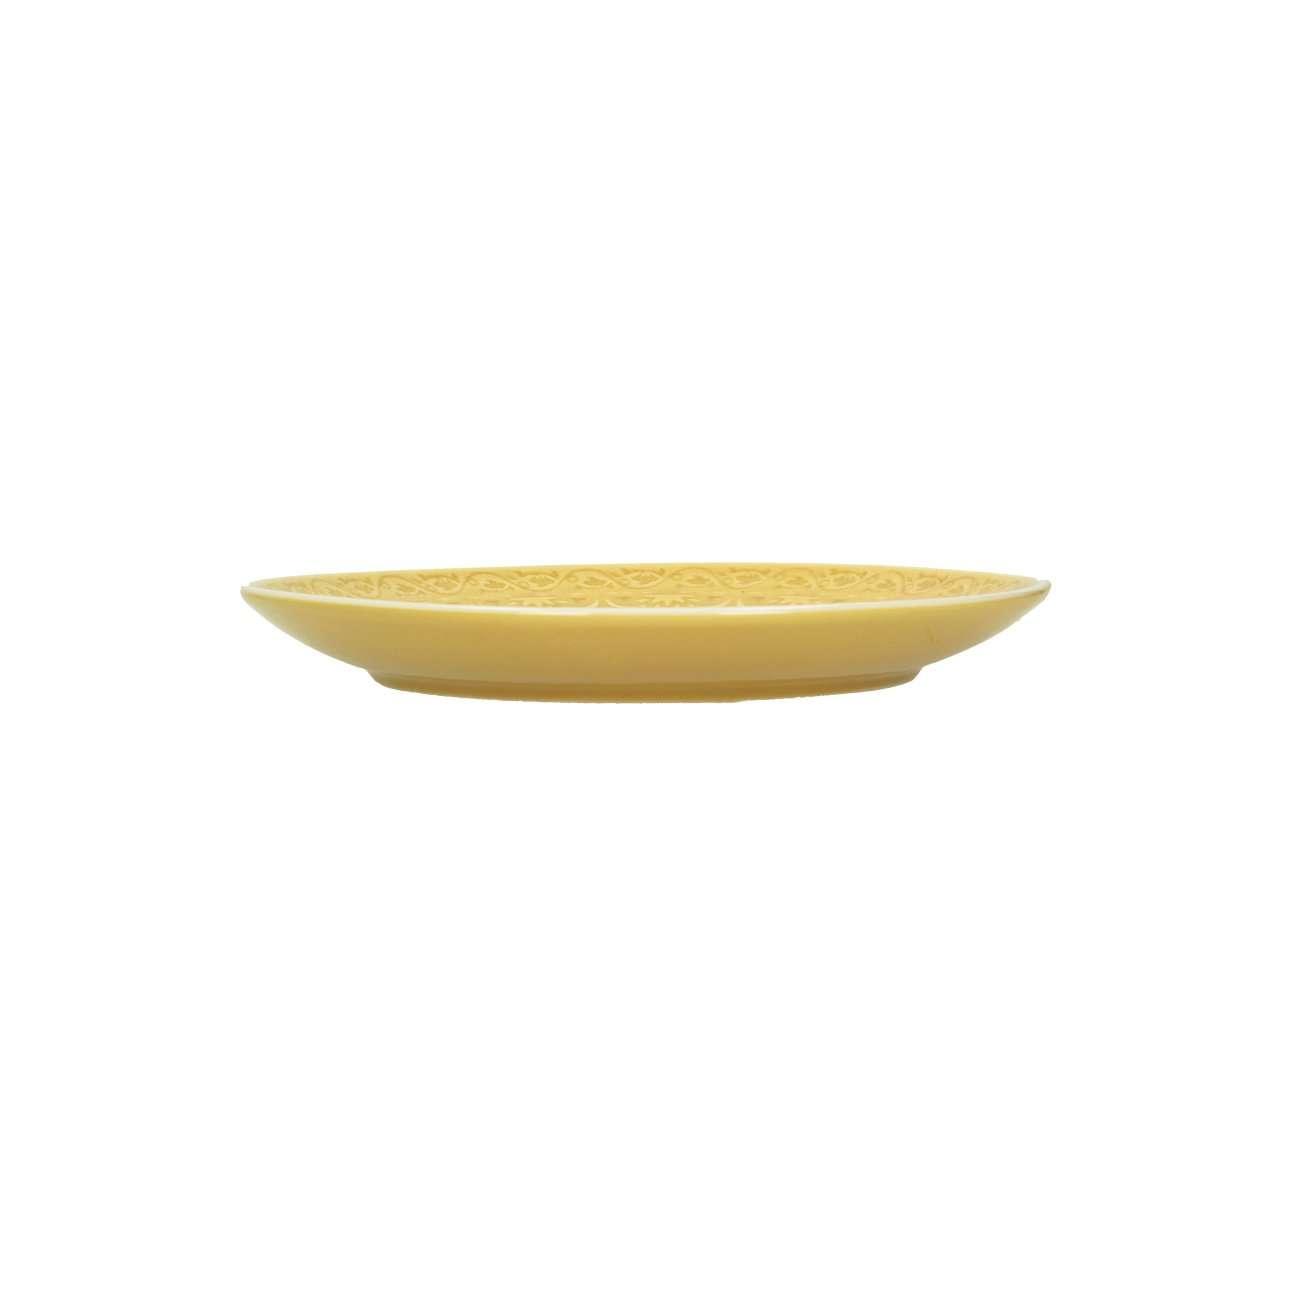 Teller Yellow Amber 20cm